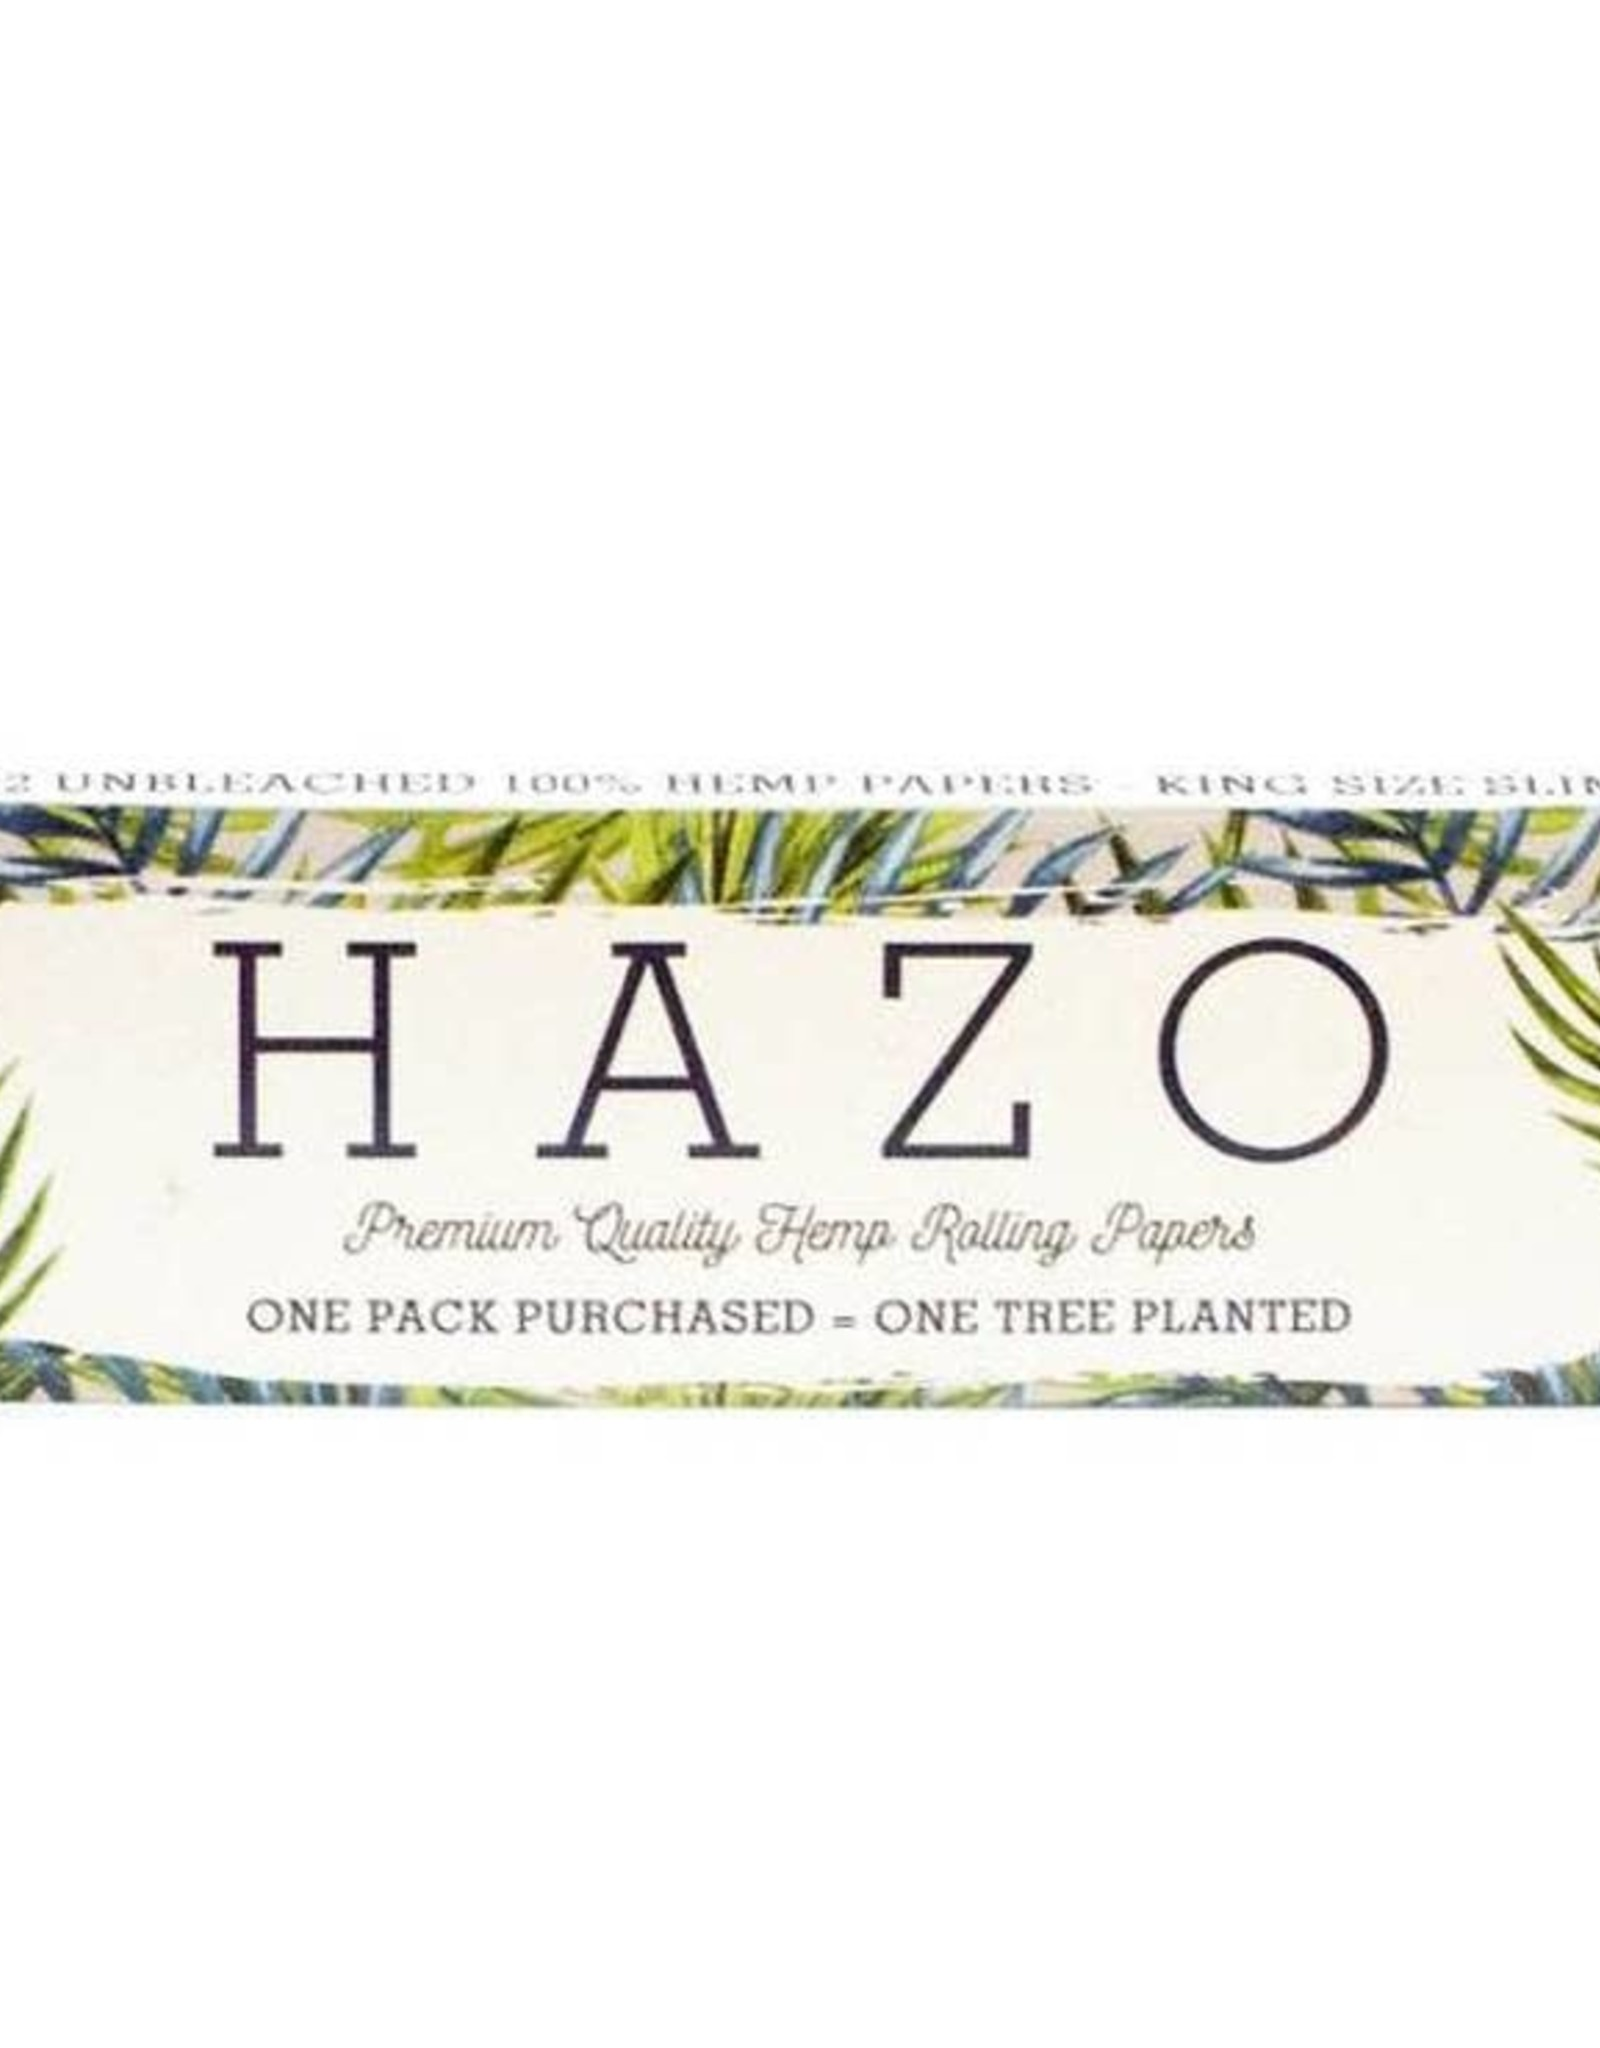 Hazo King Size Slim Papers - Hemp